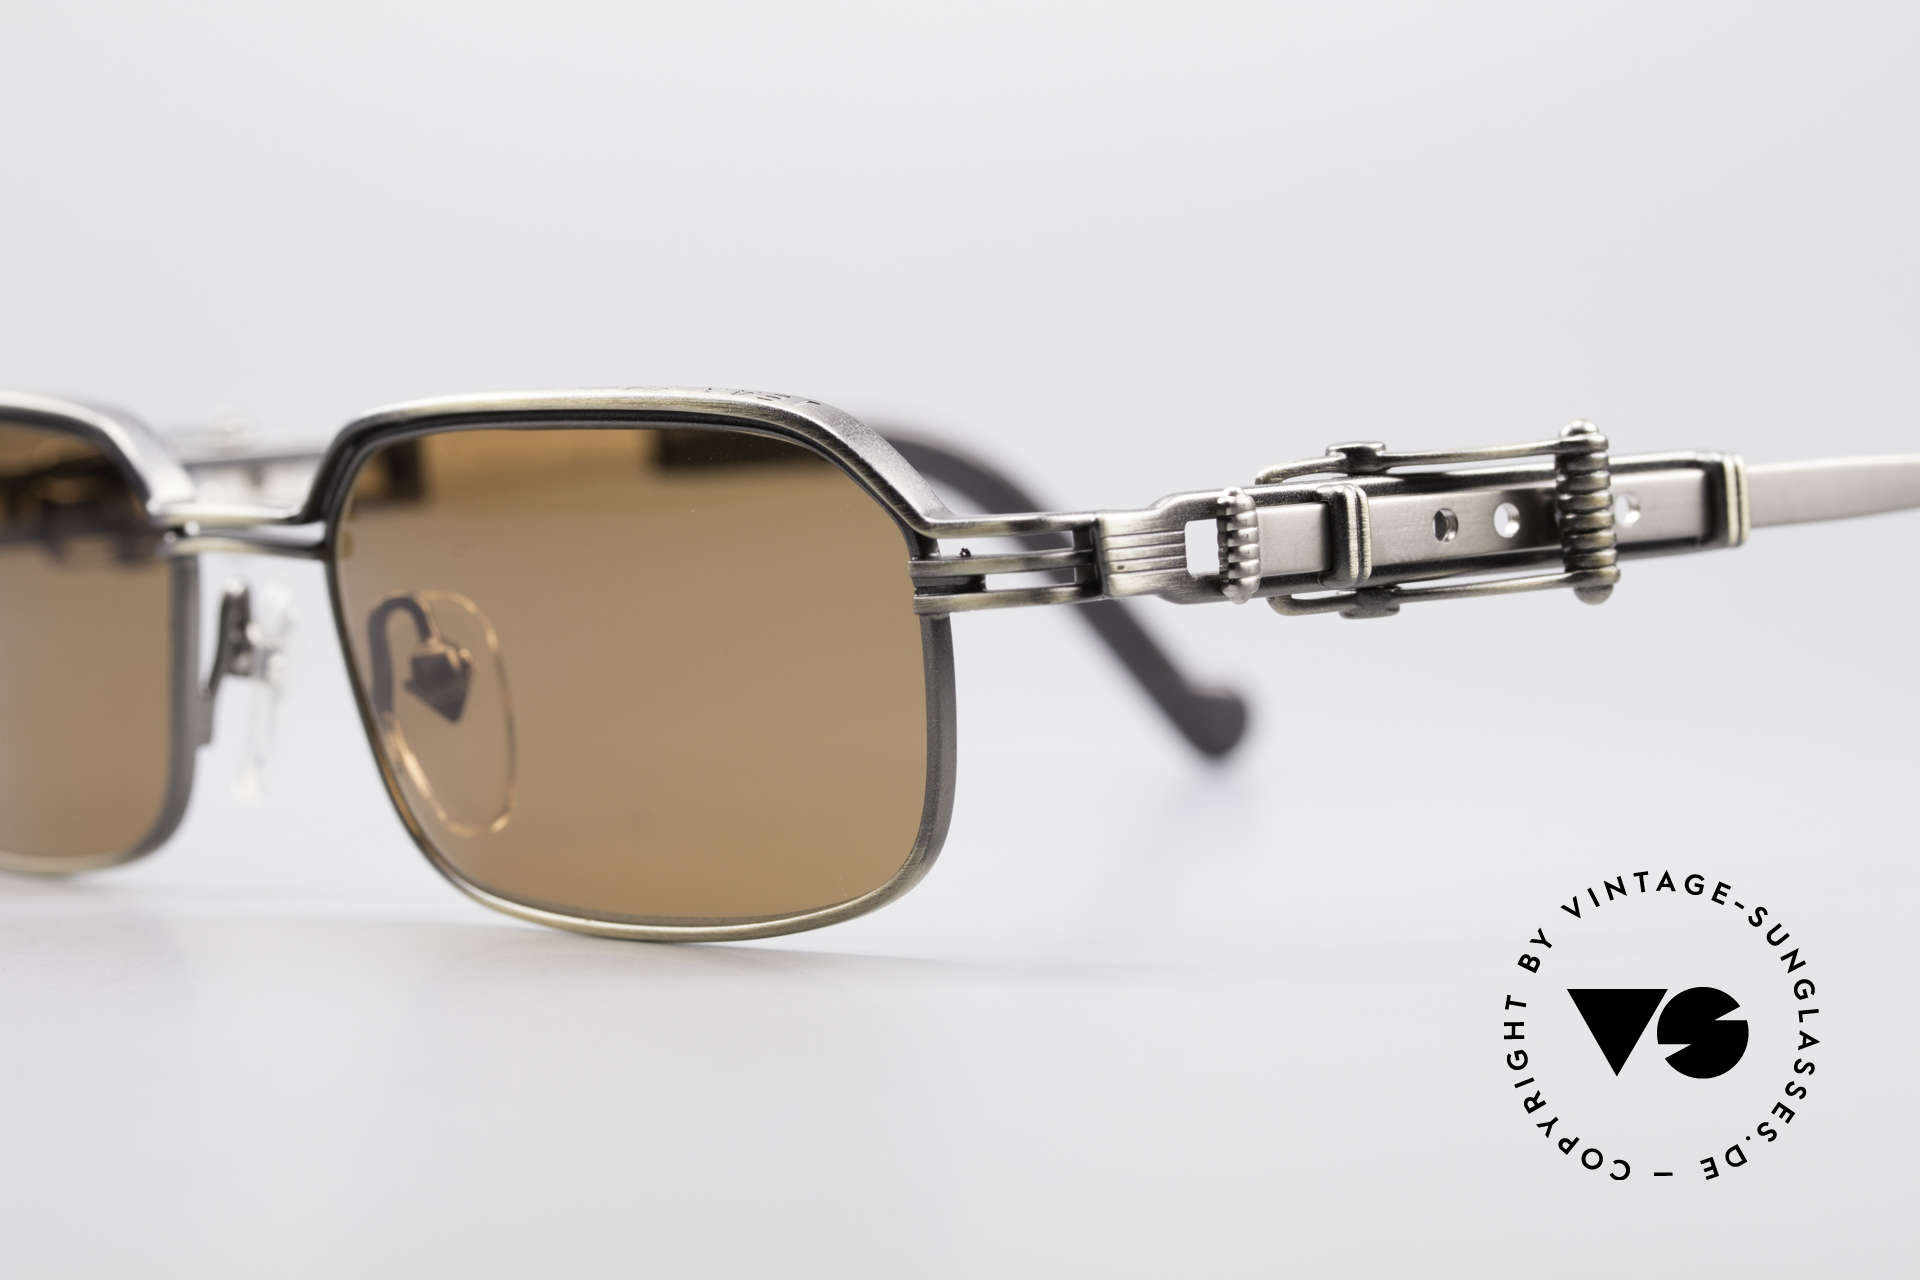 Jean Paul Gaultier 56-0002 Adjustable Frame Belt Buckle, unworn designer piece (precious, rare, treasured), Made for Men